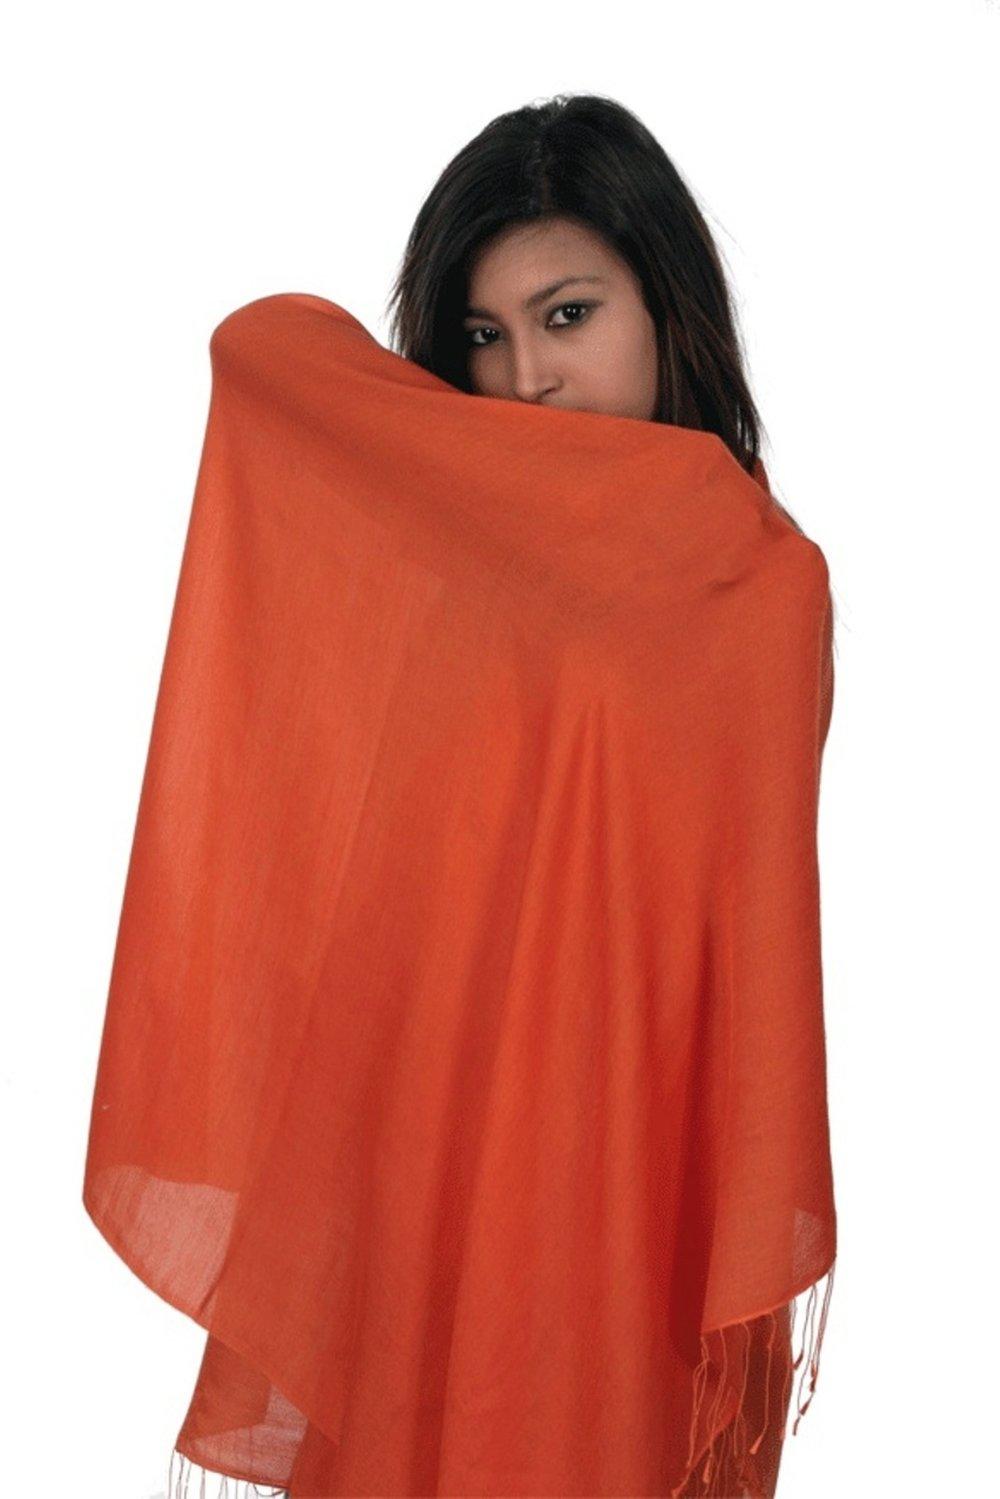 11Burnt Orange 38.jpg